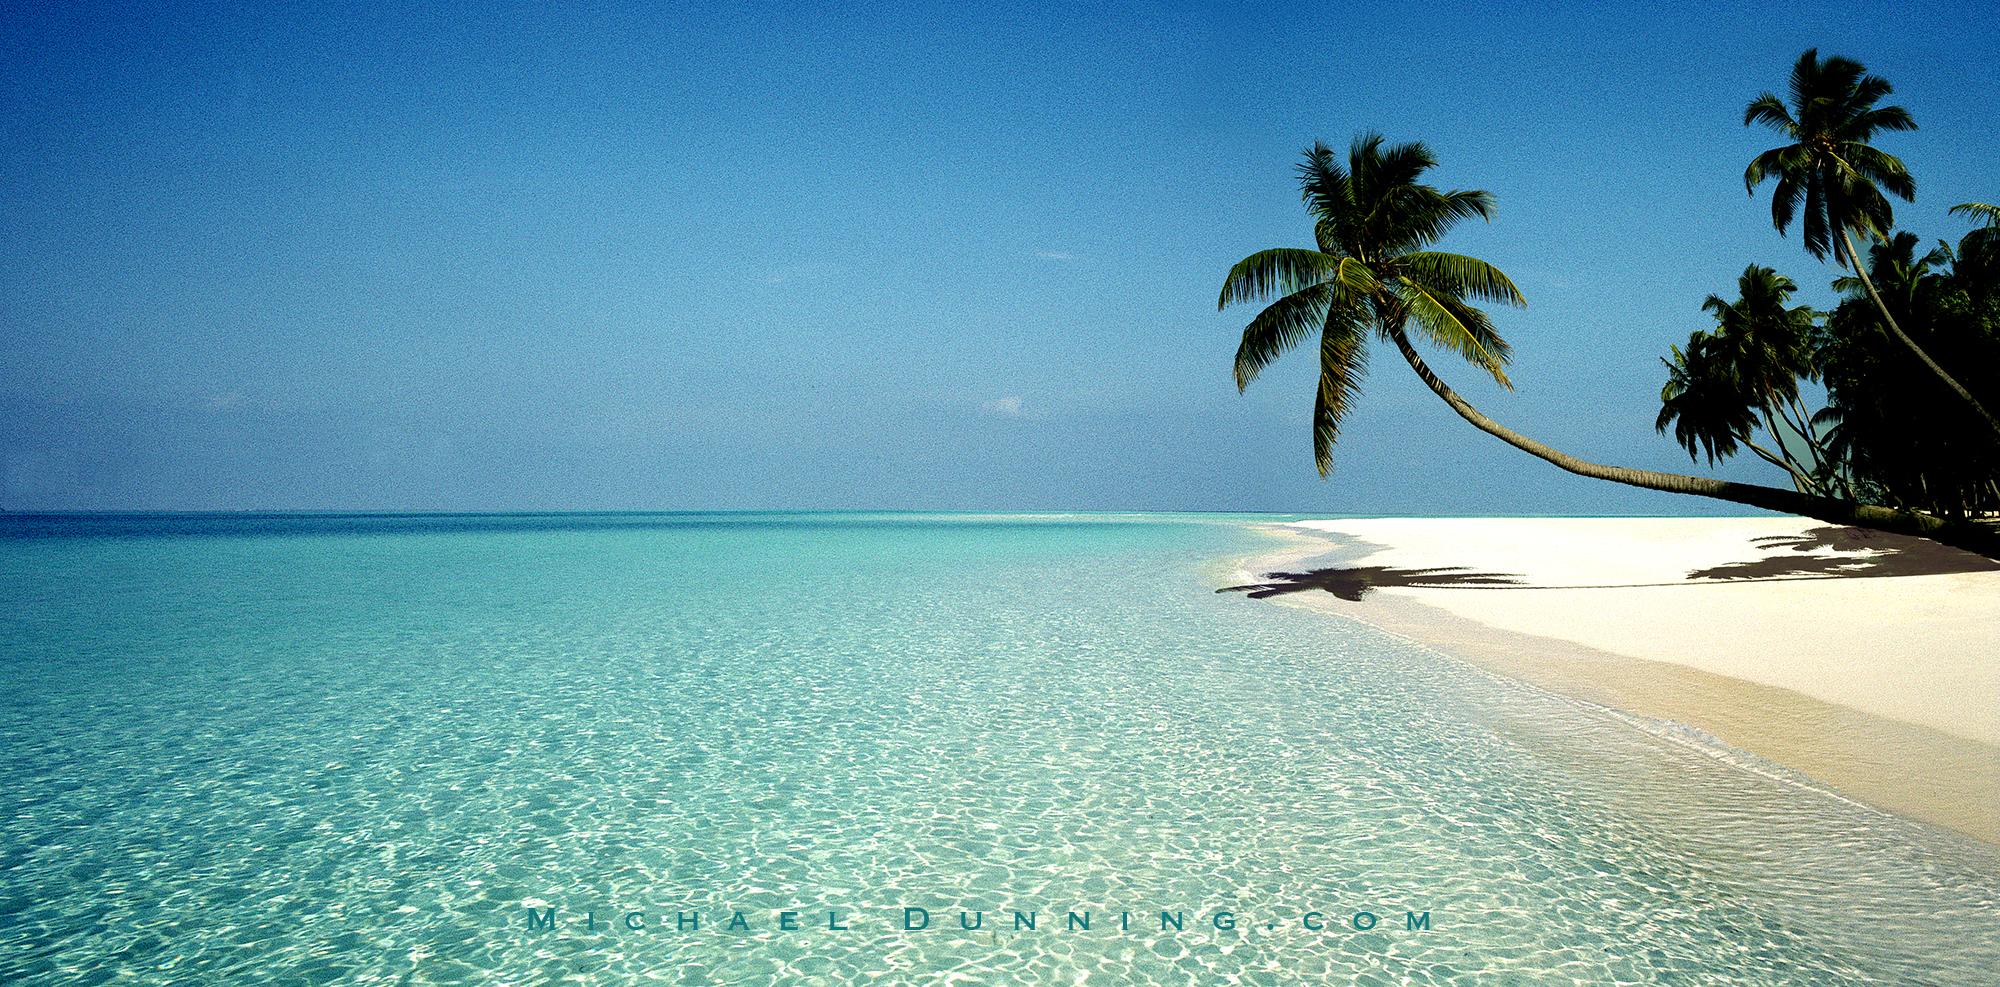 2.The Beach.Maldives. copy.jpg